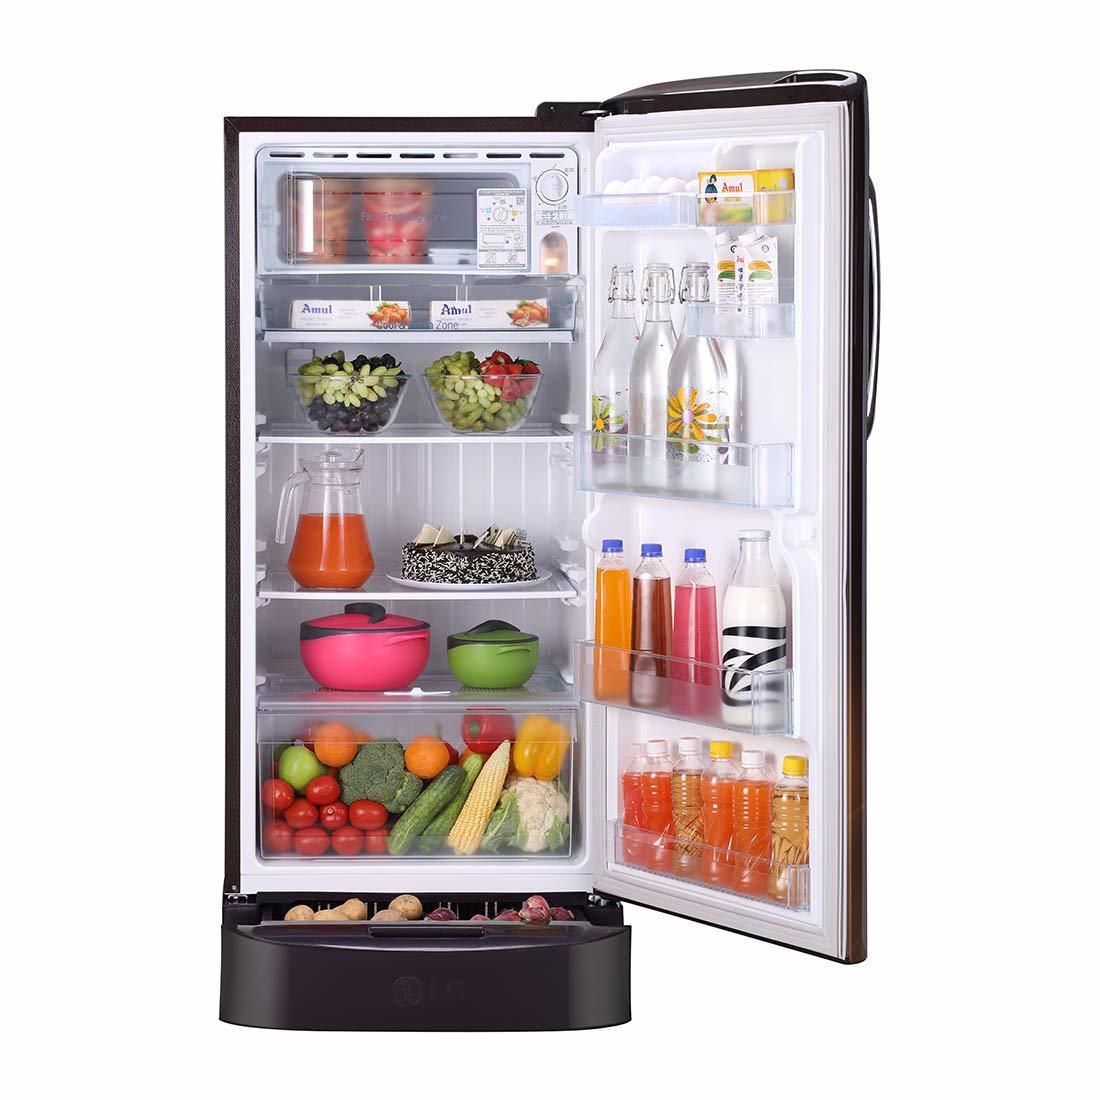 LG 215 L 5 Star ( 2019 ) Inverter Direct Cool Single Door Refrigerator (GL-D221AHPY, Hazel Plumeria)